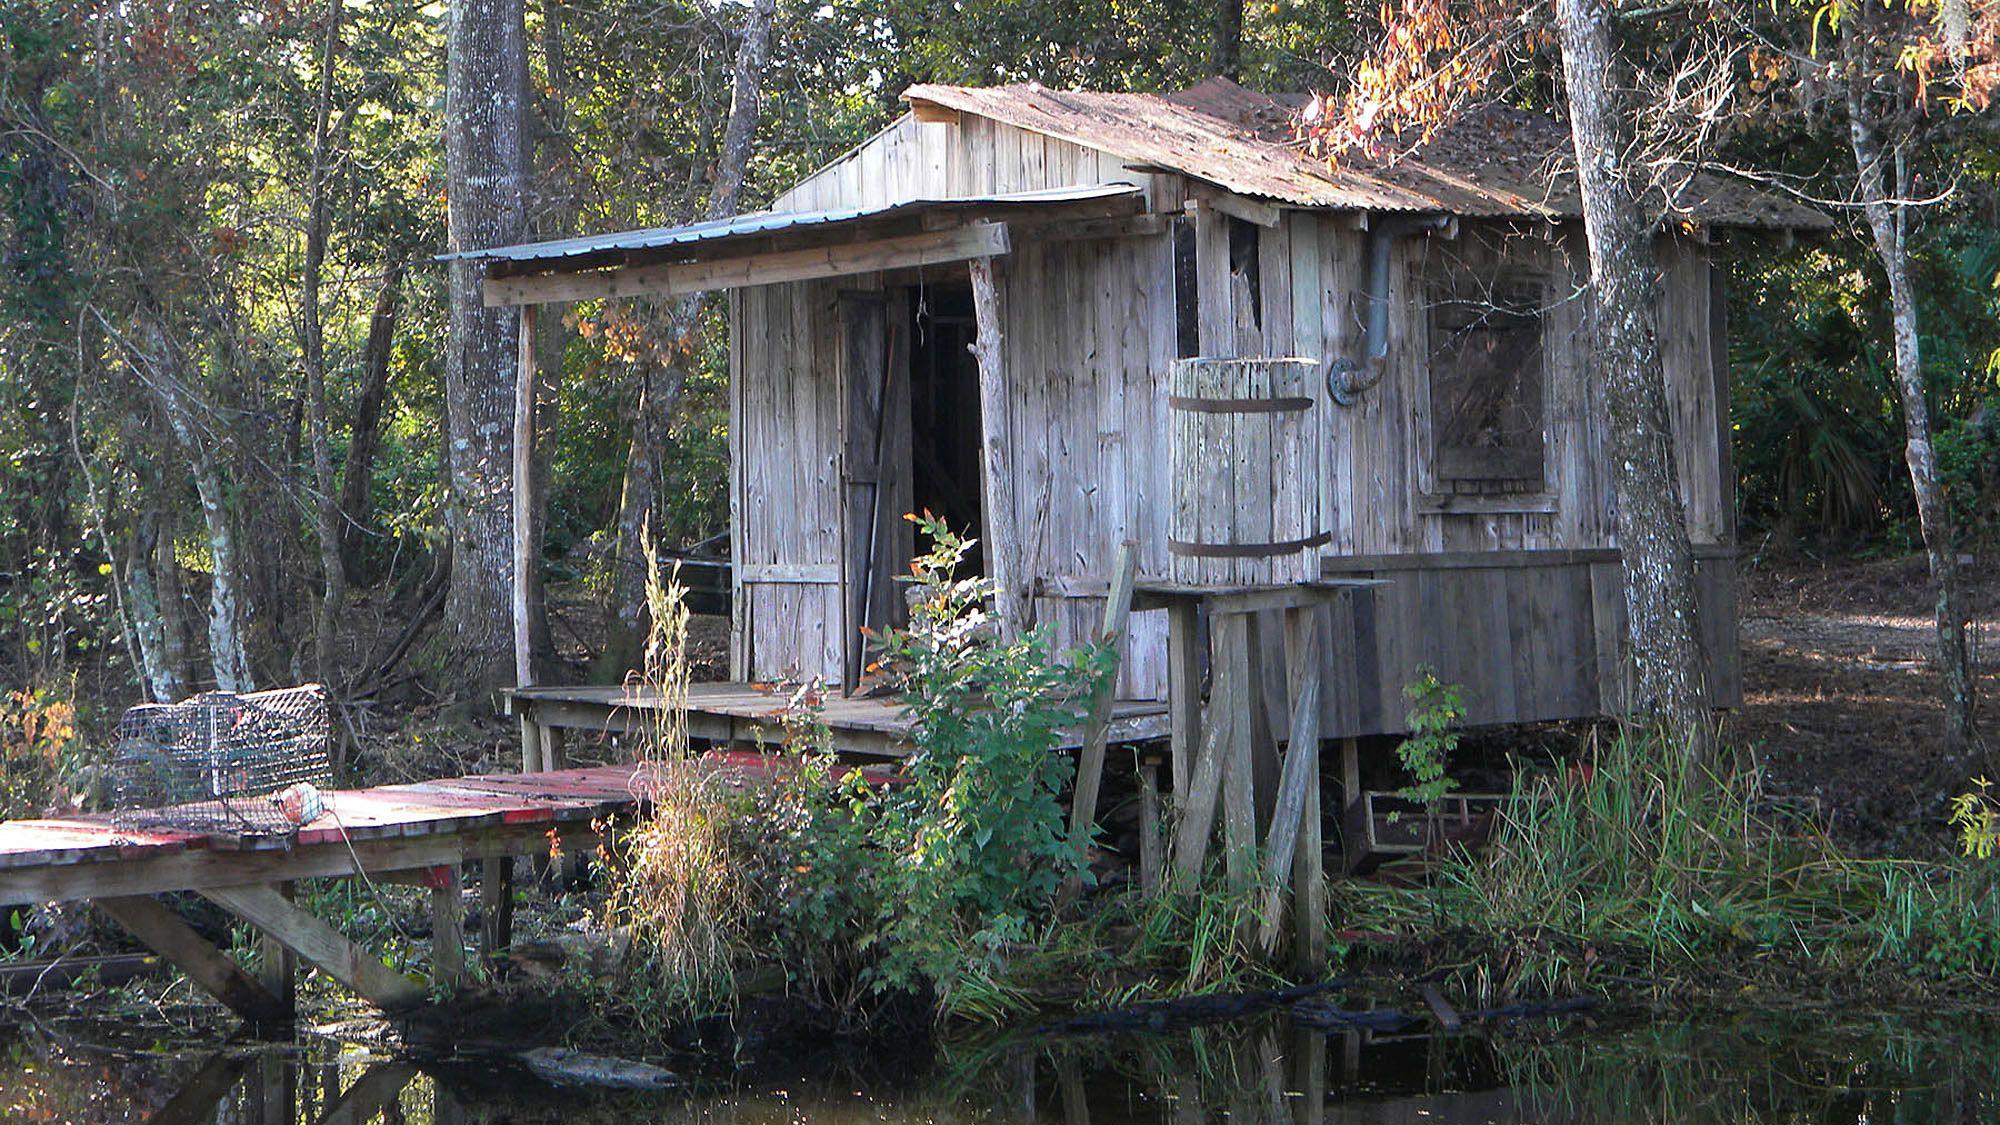 Jean Lafitte Swamp & Bayou Boat Tour